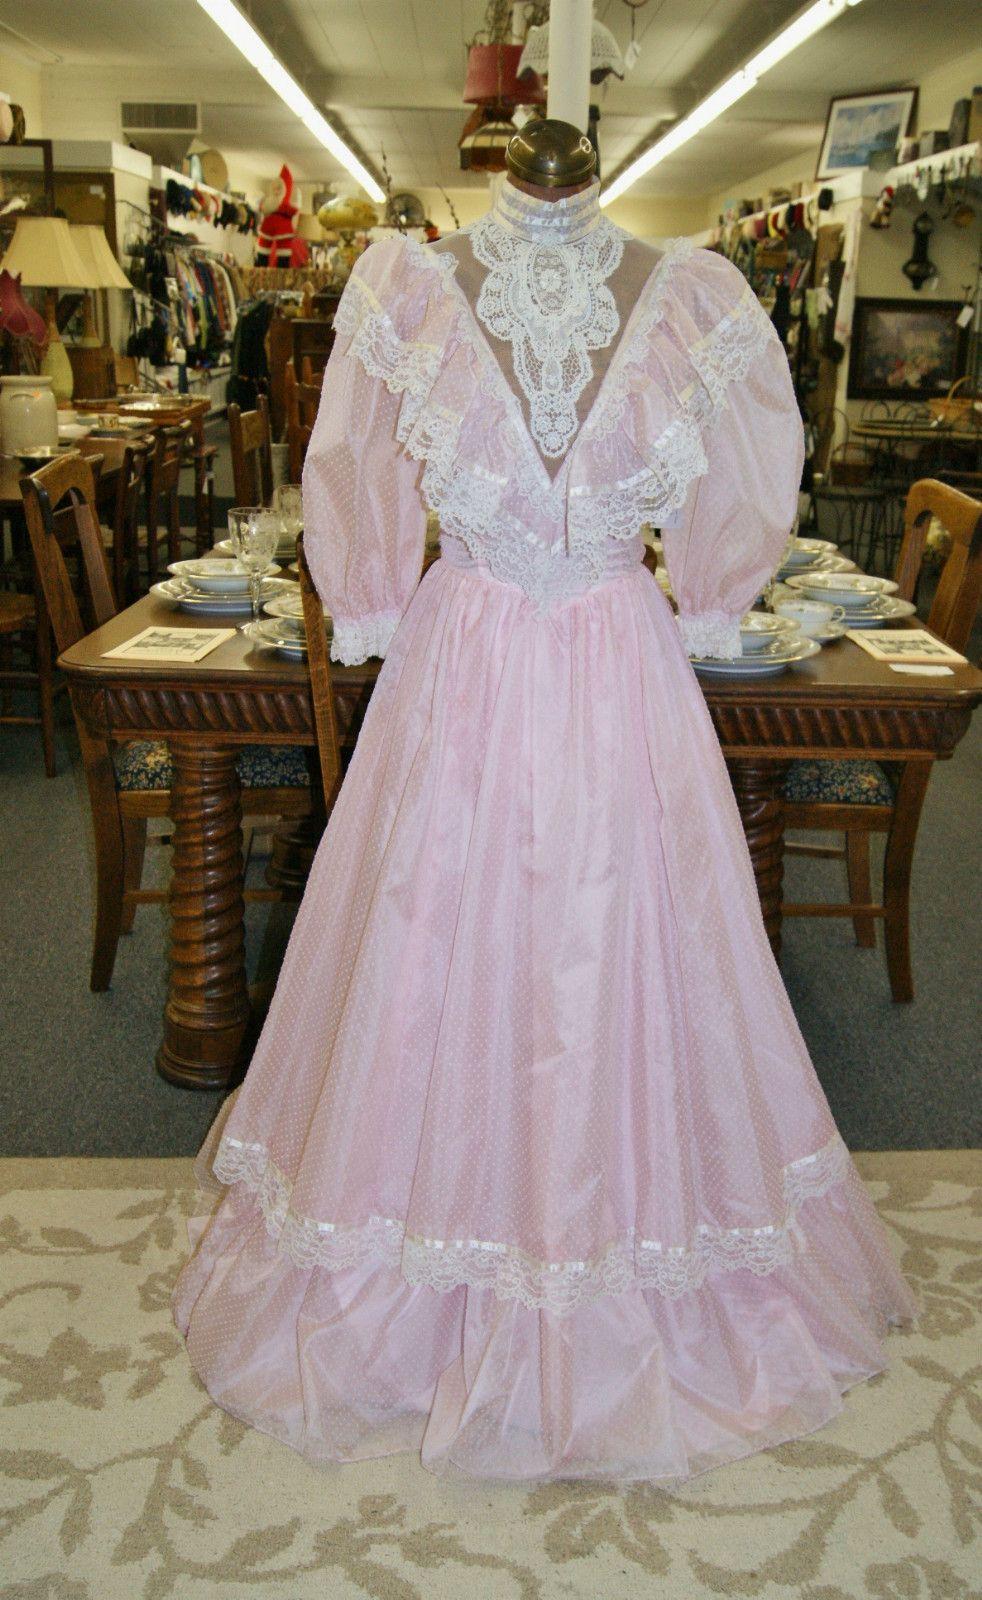 Vintage s gunne sax formal prom dress by jessica mcclintock size